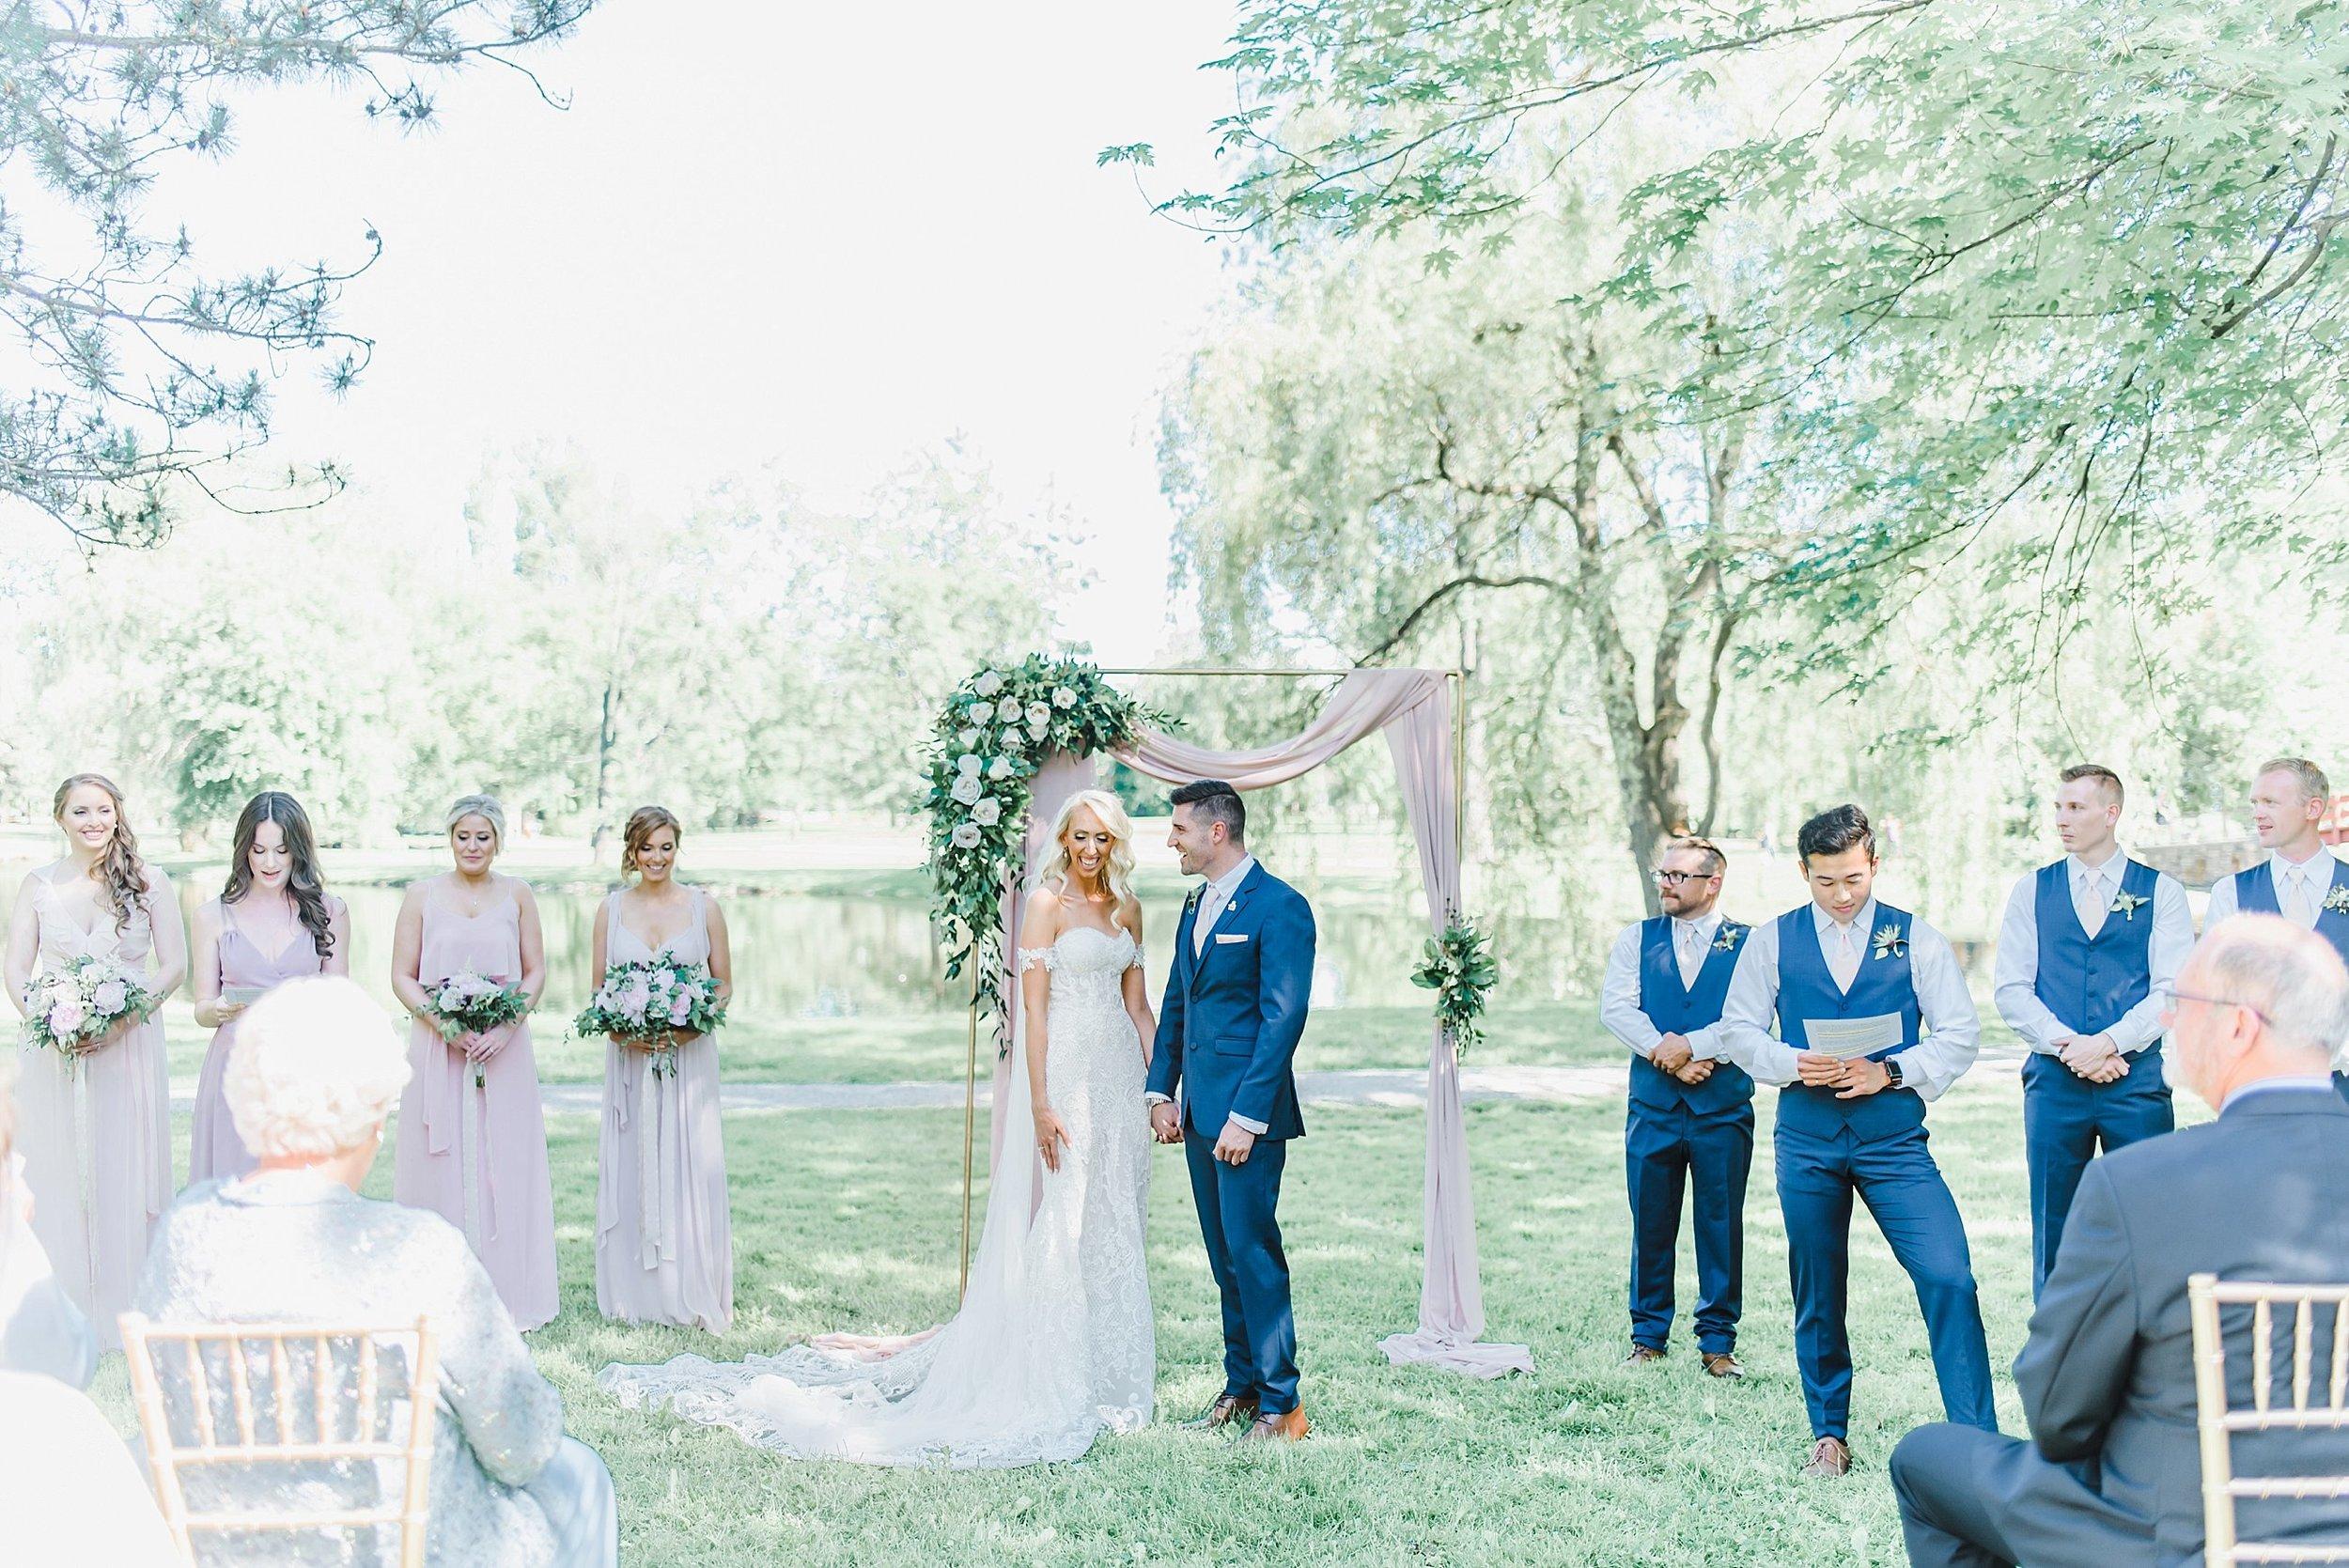 light airy indie fine art ottawa wedding photographer | Ali and Batoul Photography_0065.jpg